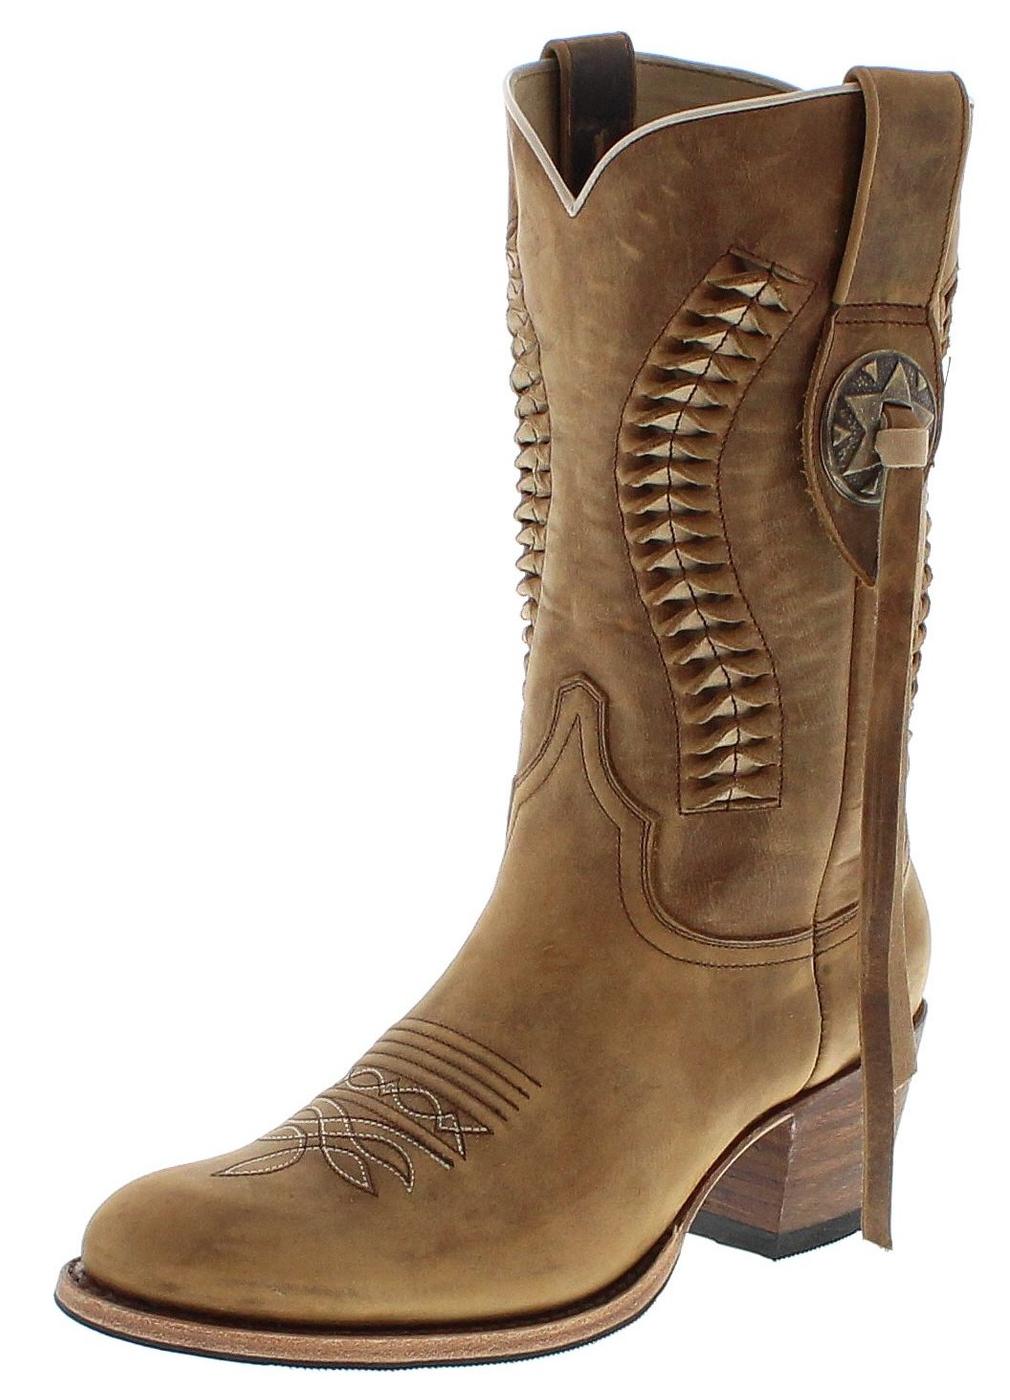 Sendra Boots 13394 Tang Fashion Westernstiefel braun